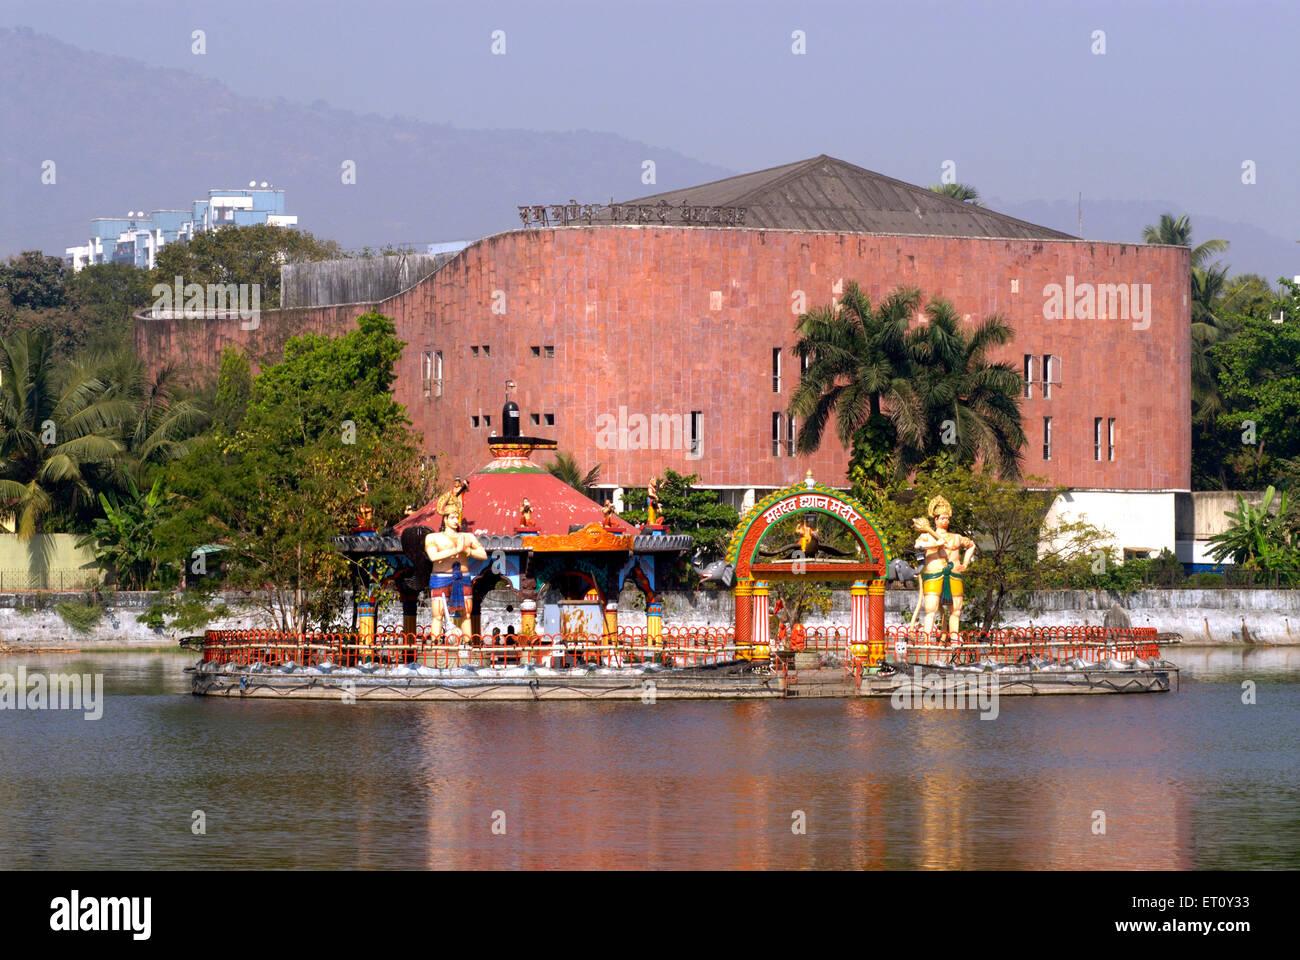 Ram Ganesh Gadkari Rangayatan Marathi drama theatre Masunda lake or Talao Pali Thane Mumbai Maharashtra India - Stock Image